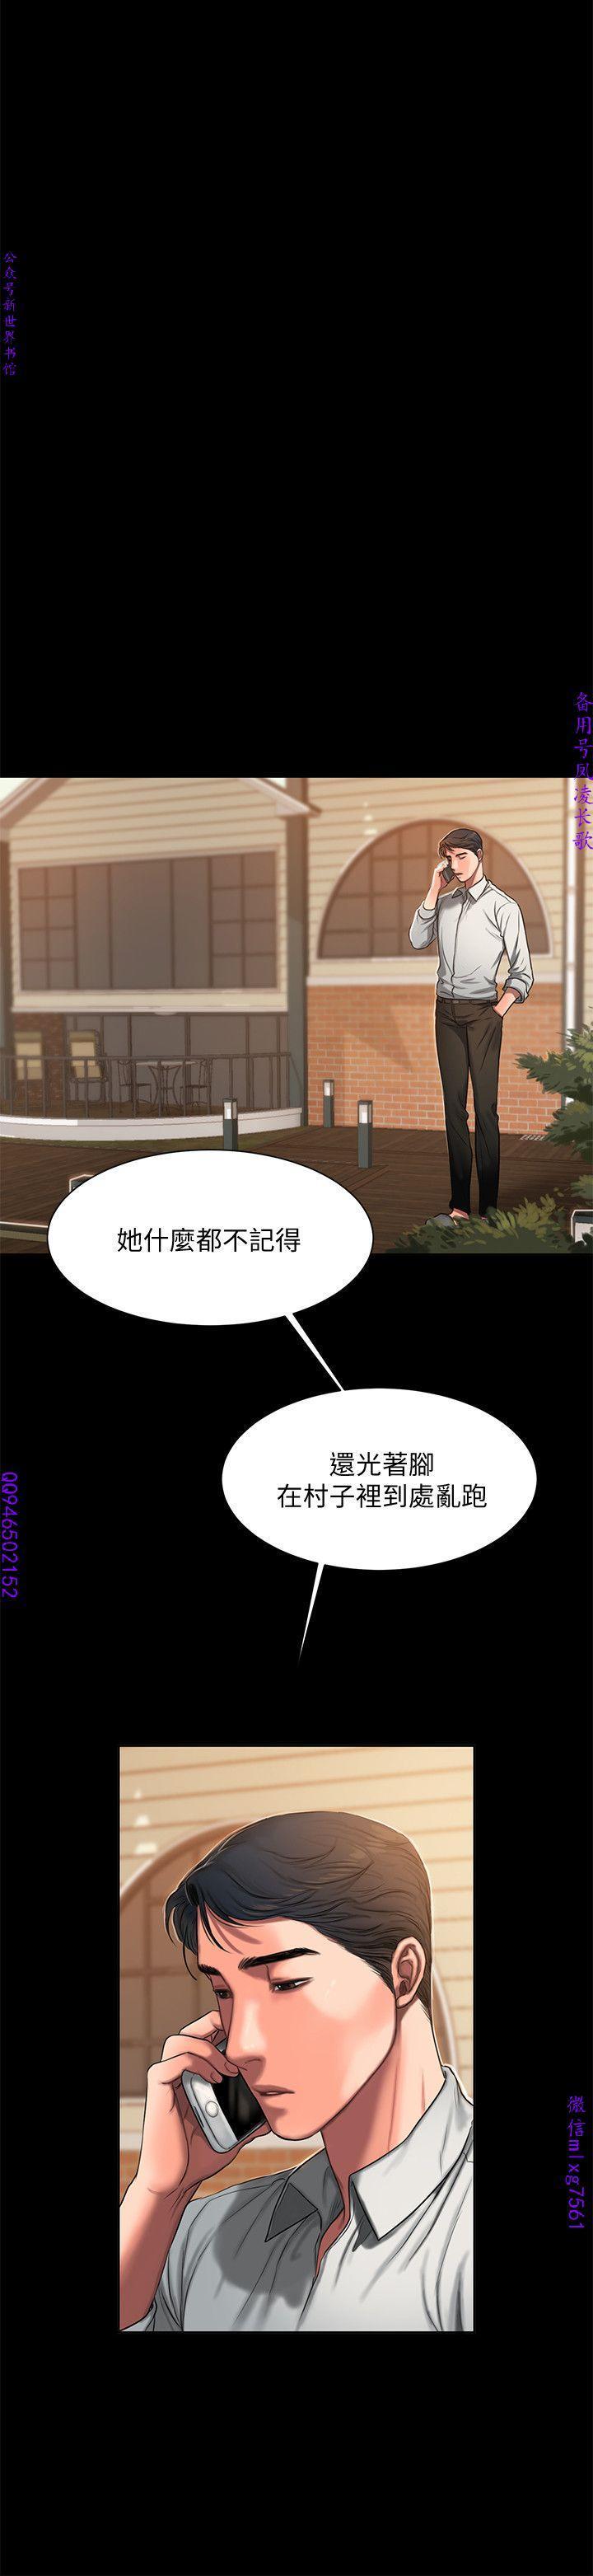 Run away 1-10【中文】 174